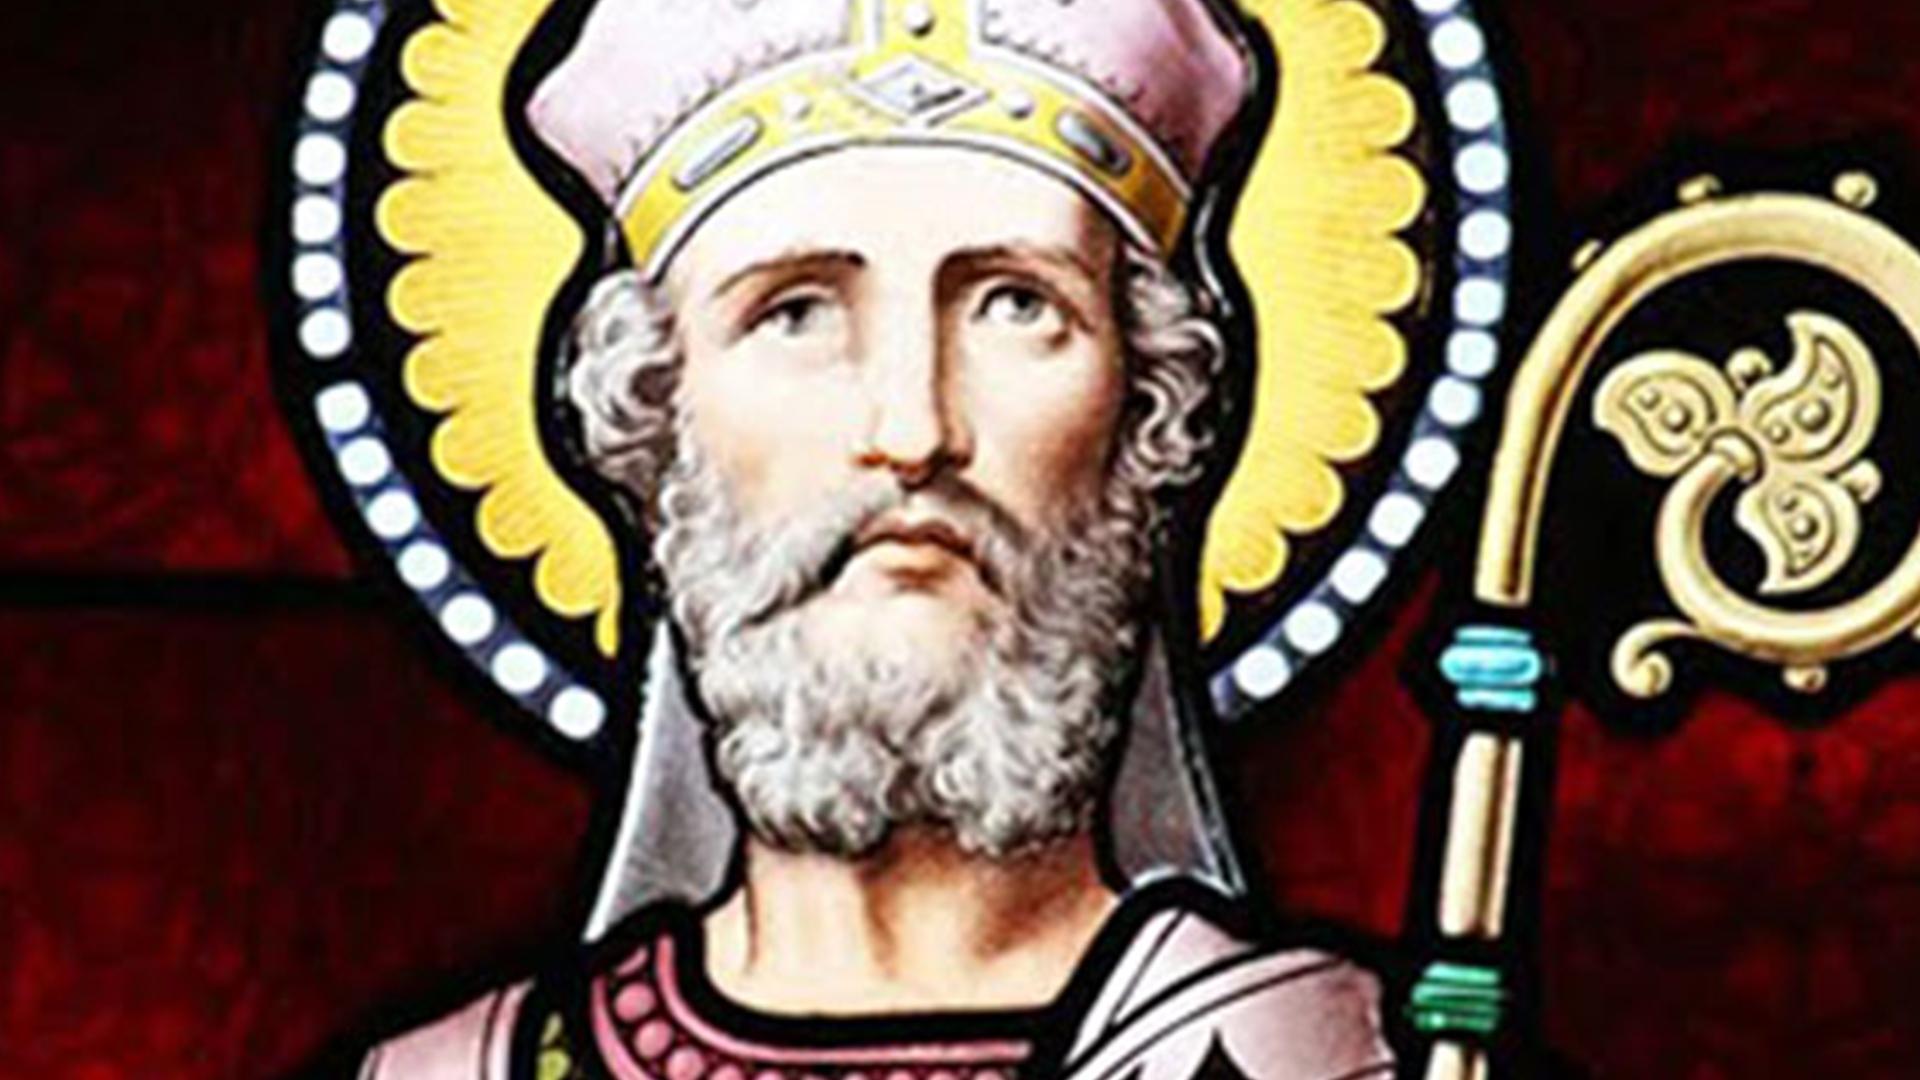 Divine Rite of Kings